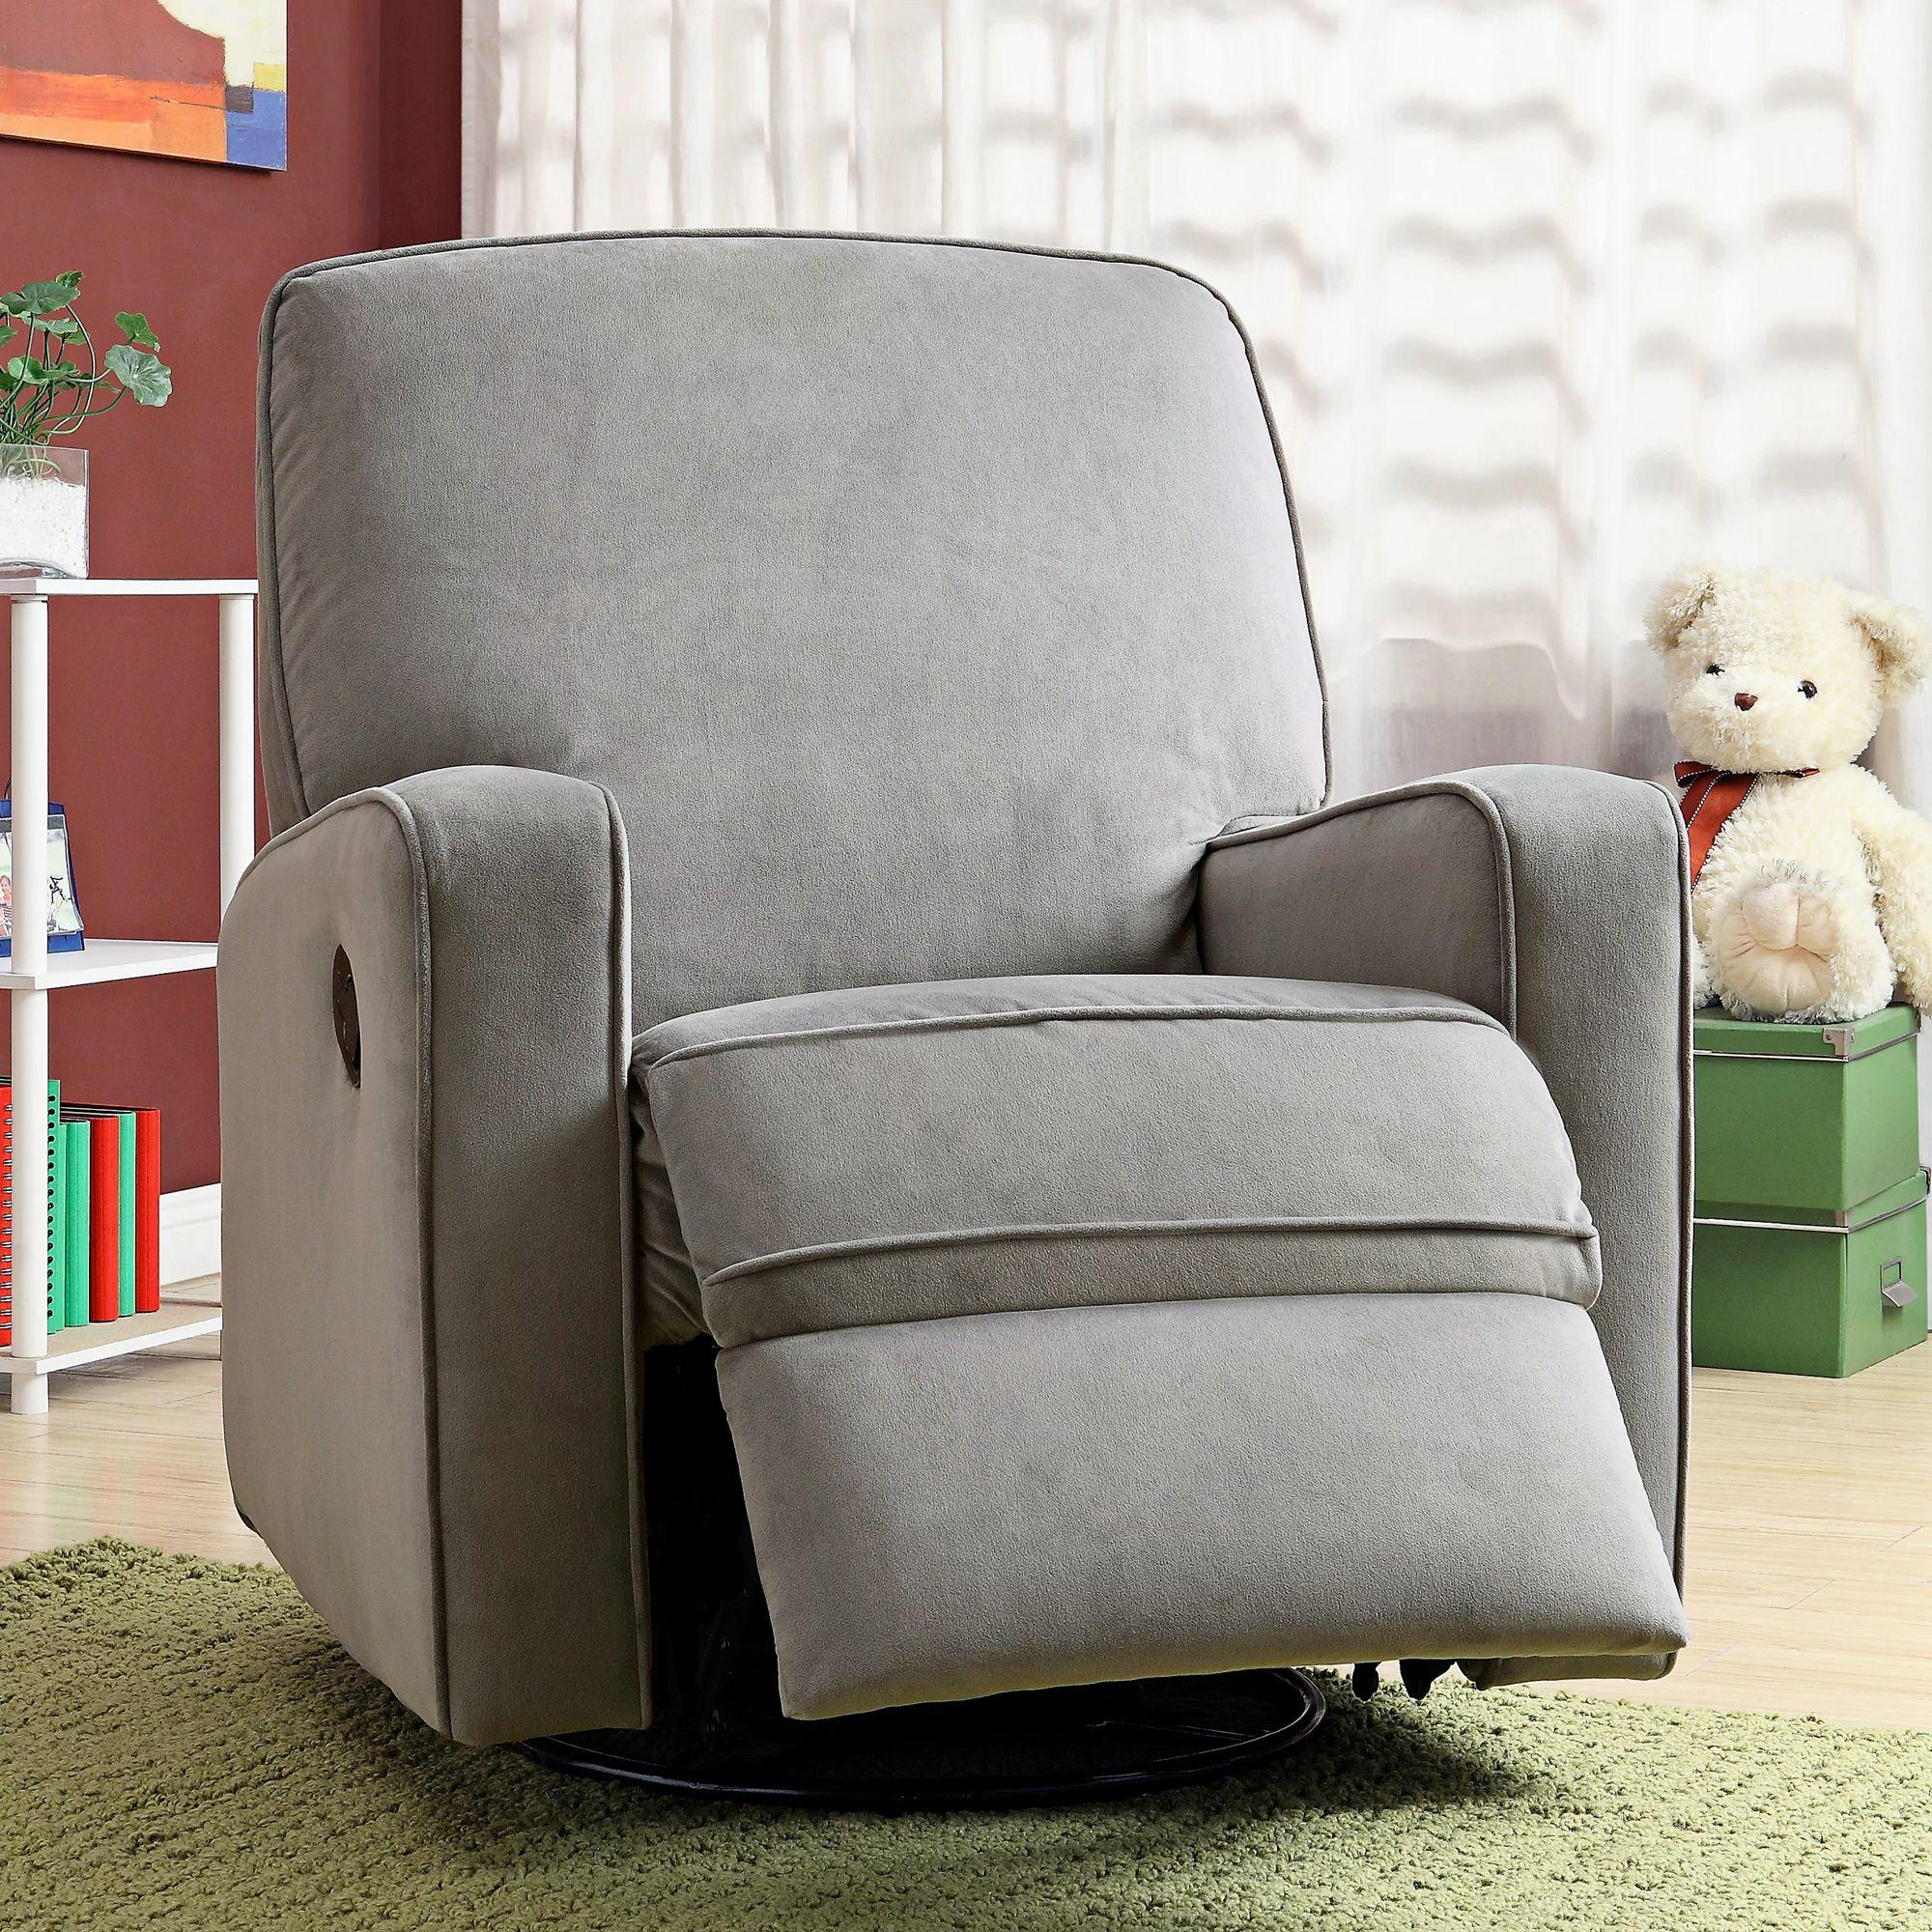 sutton stella zen gray upholstered swivel glider recliner